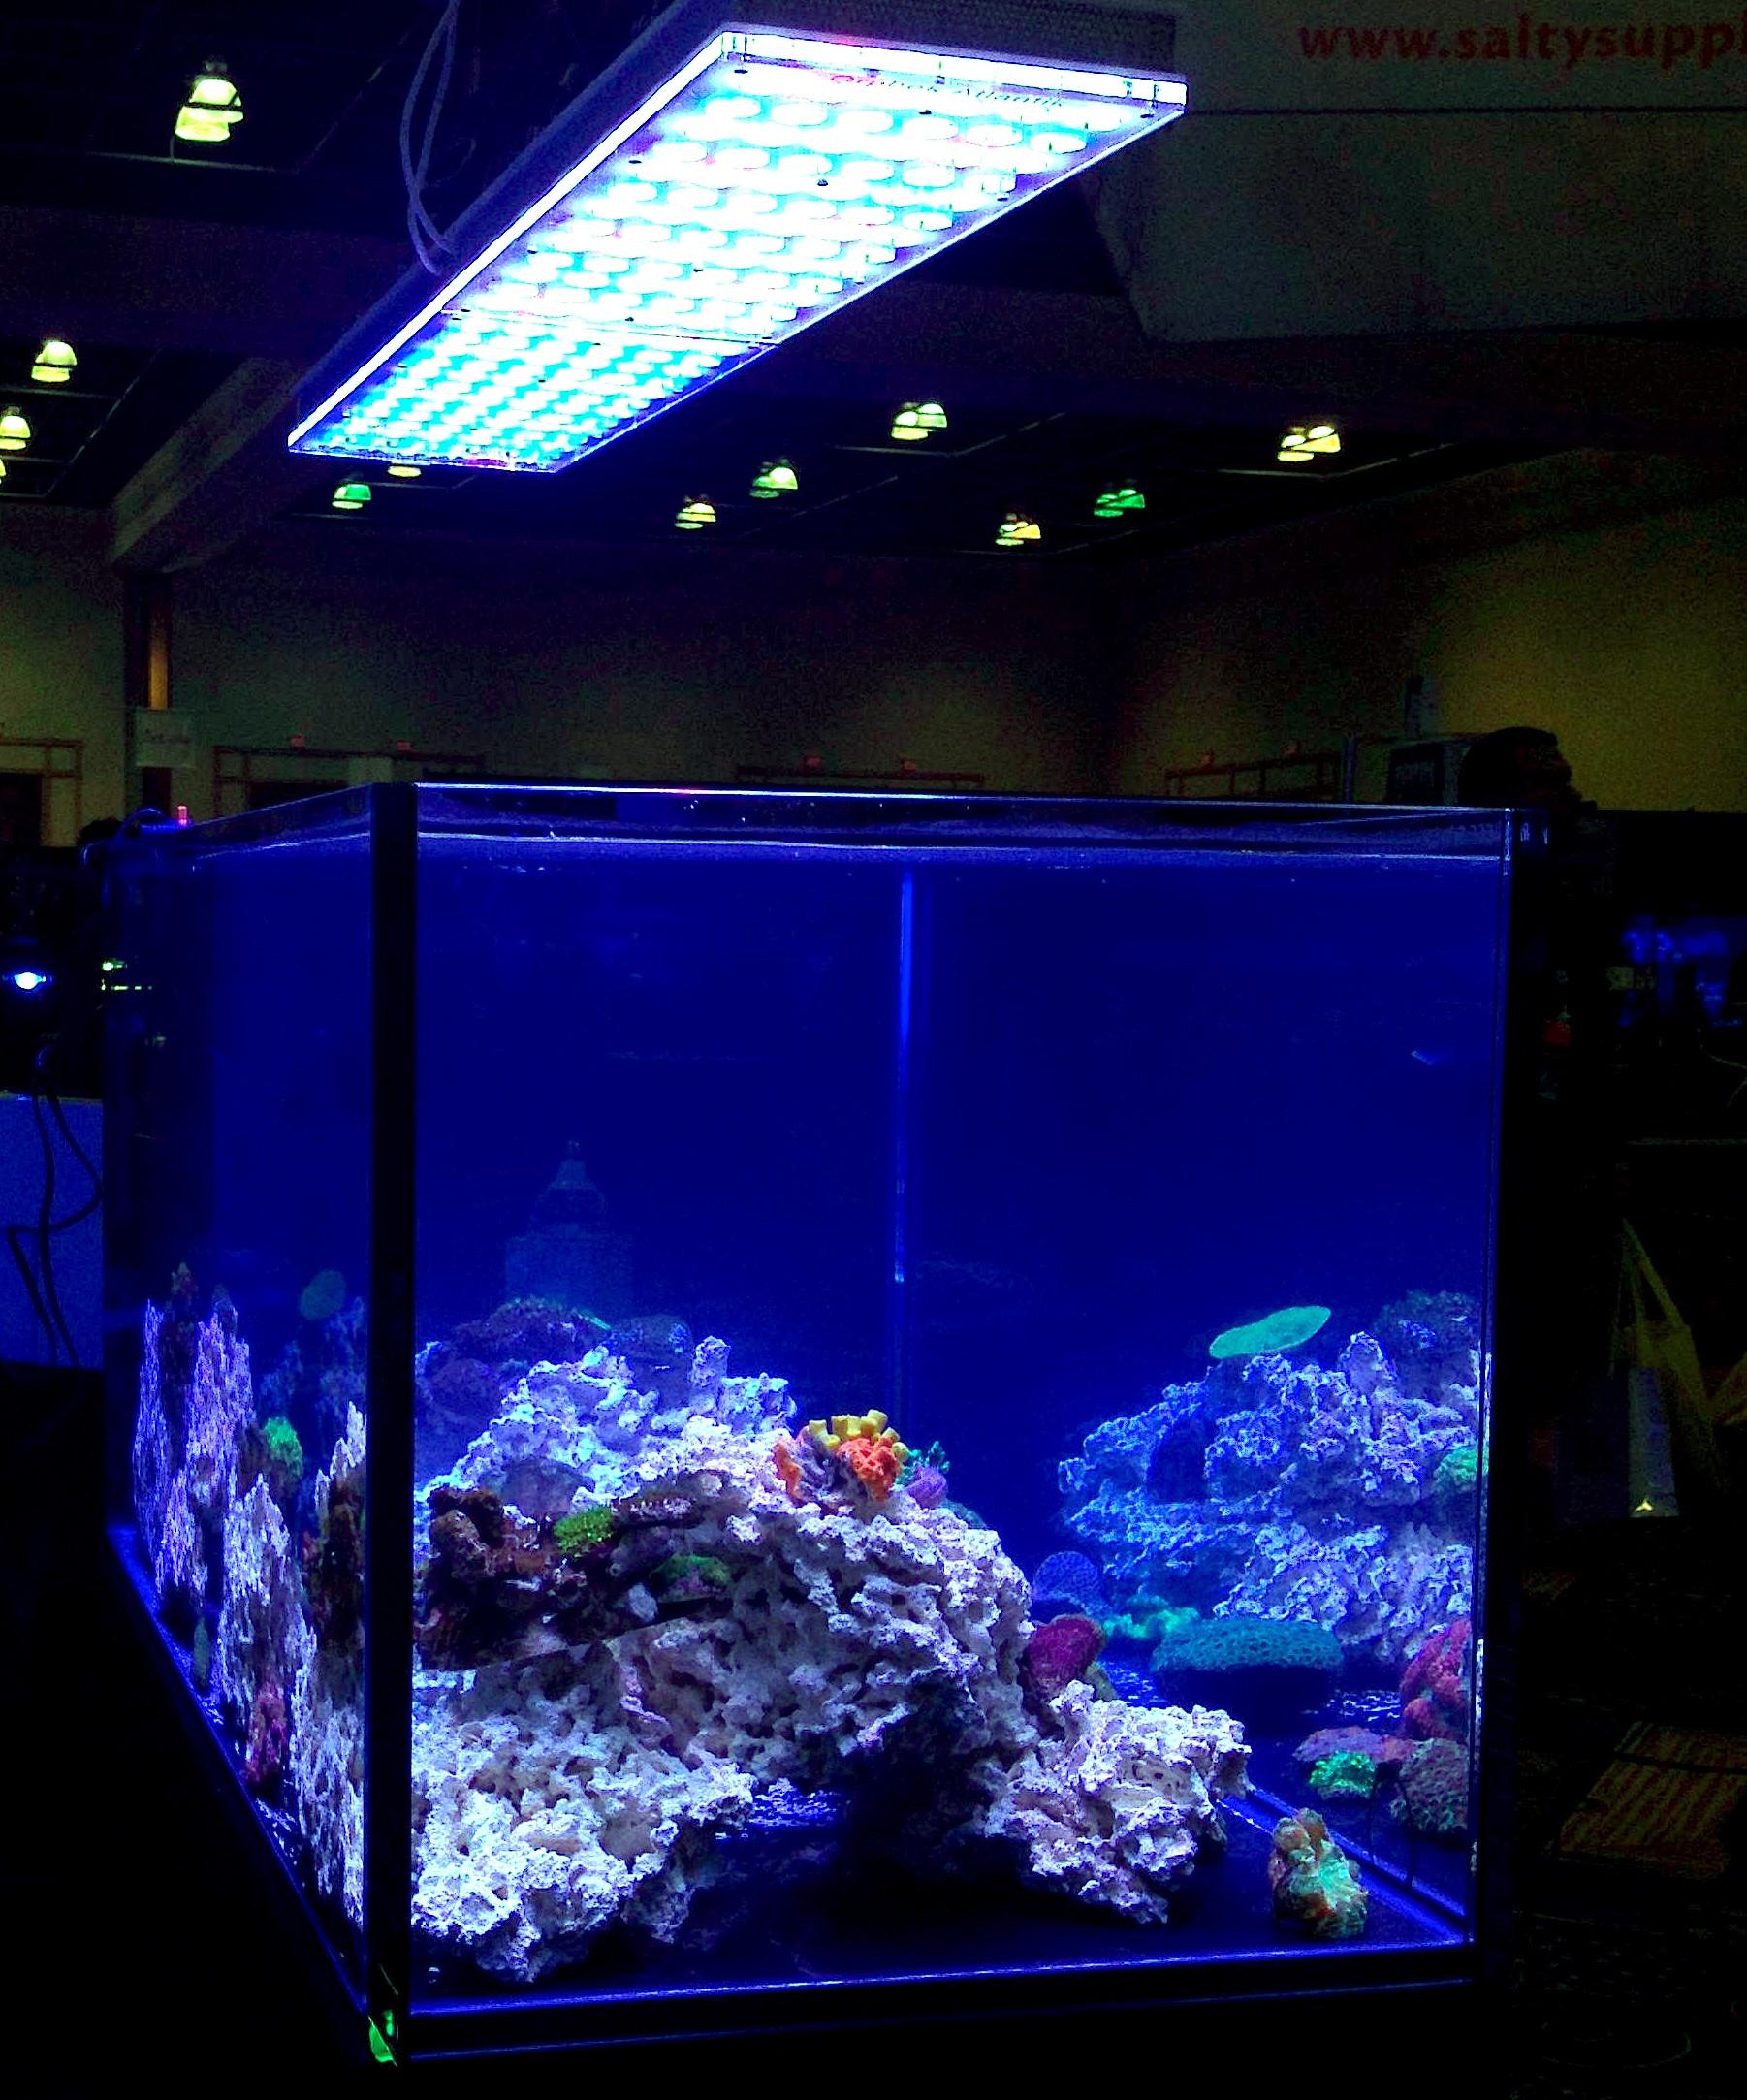 Best ideas about Led Aquarium Lights . Save or Pin IN DEPTH UNDERSTANDING OF ORPHEK ATLANTIK V2 Now.